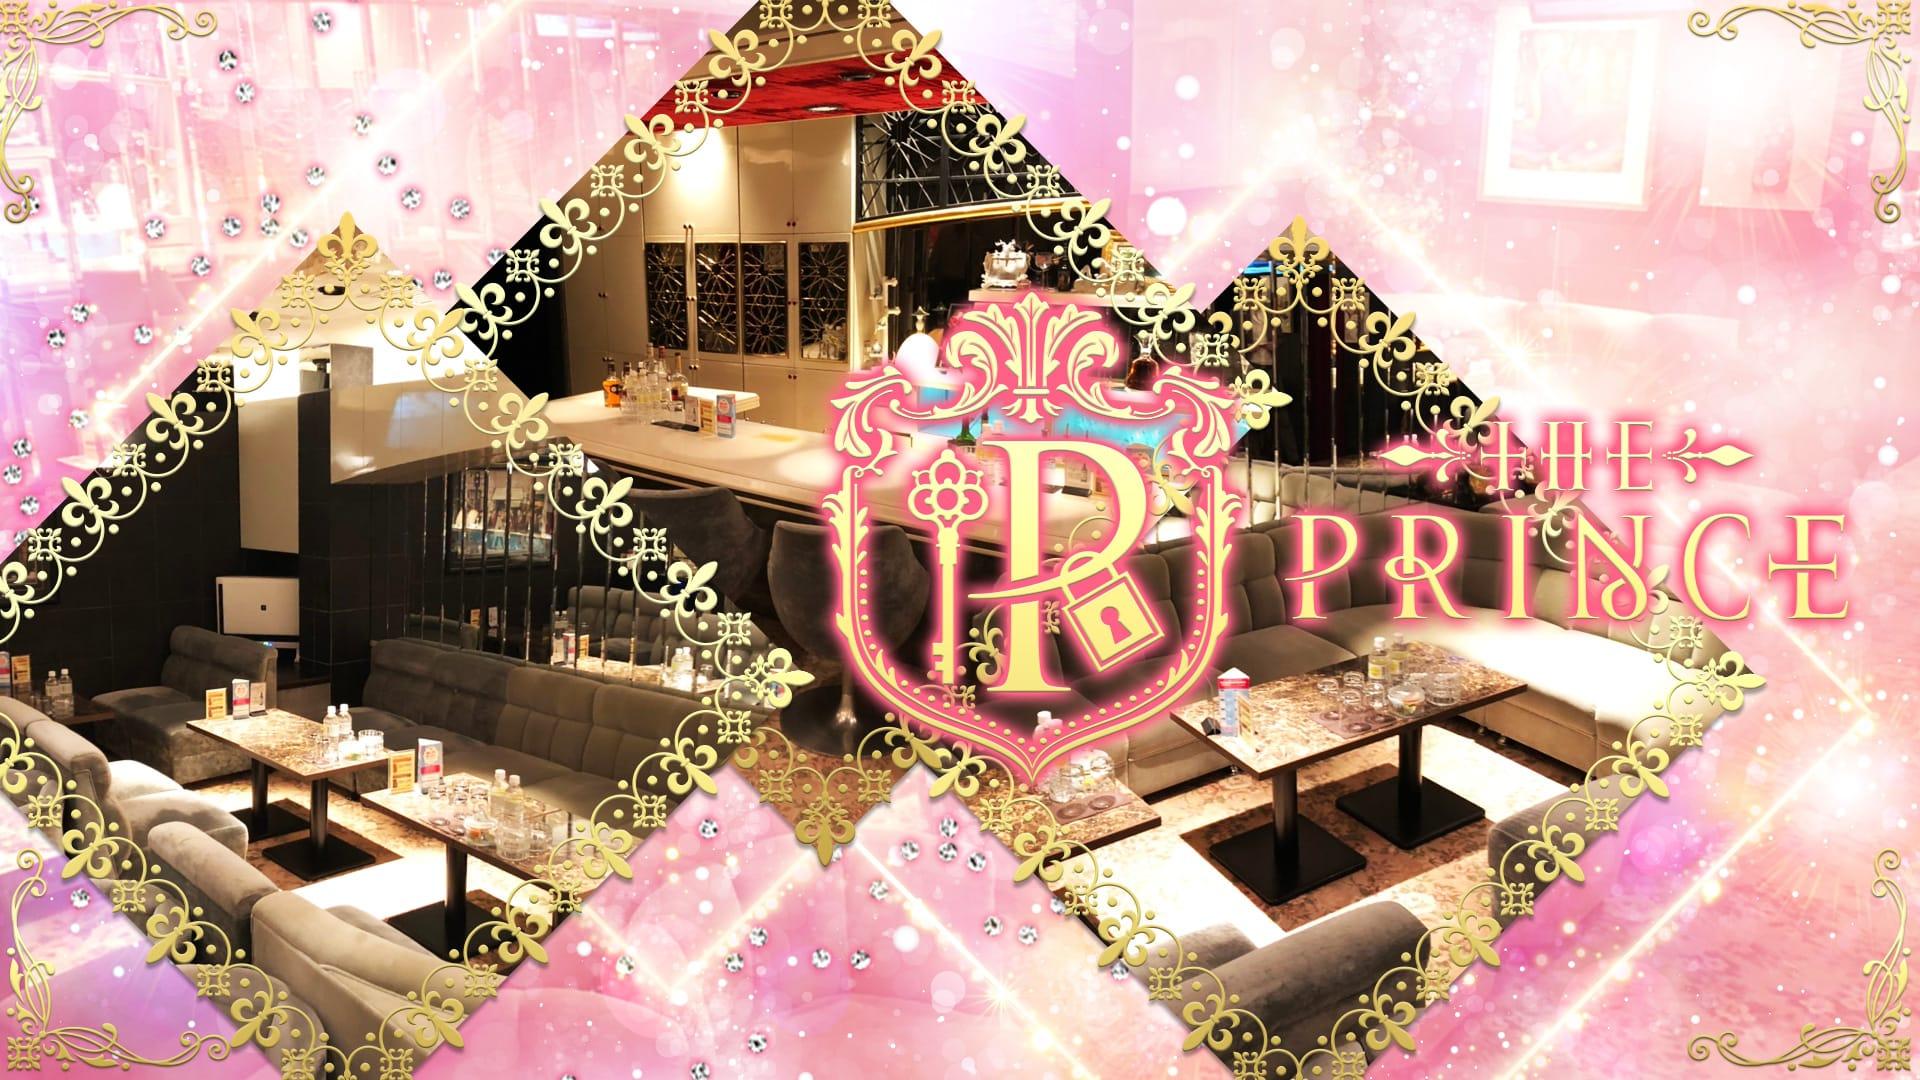 THE PRINCE(プリンス) 中洲キャバクラ TOP画像